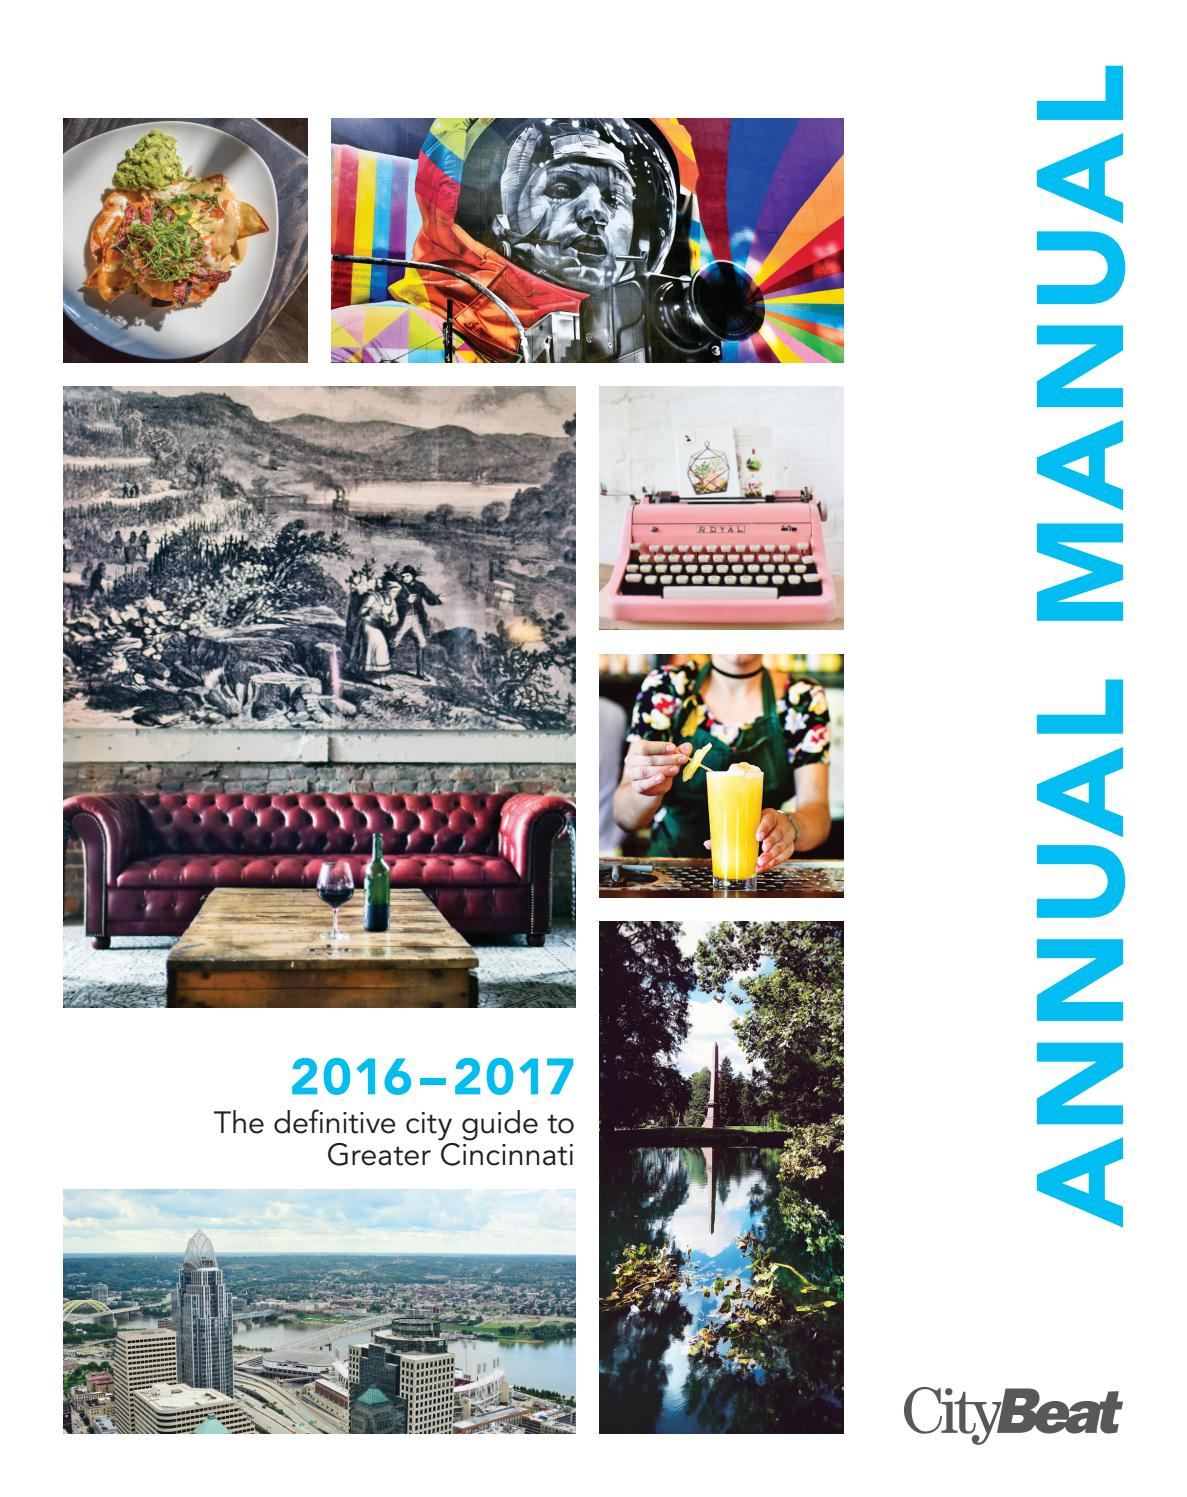 Annual Manual 2016 17 By Cincinnati Citybeat Issuu Cyclone 4100 Wiring Diagram